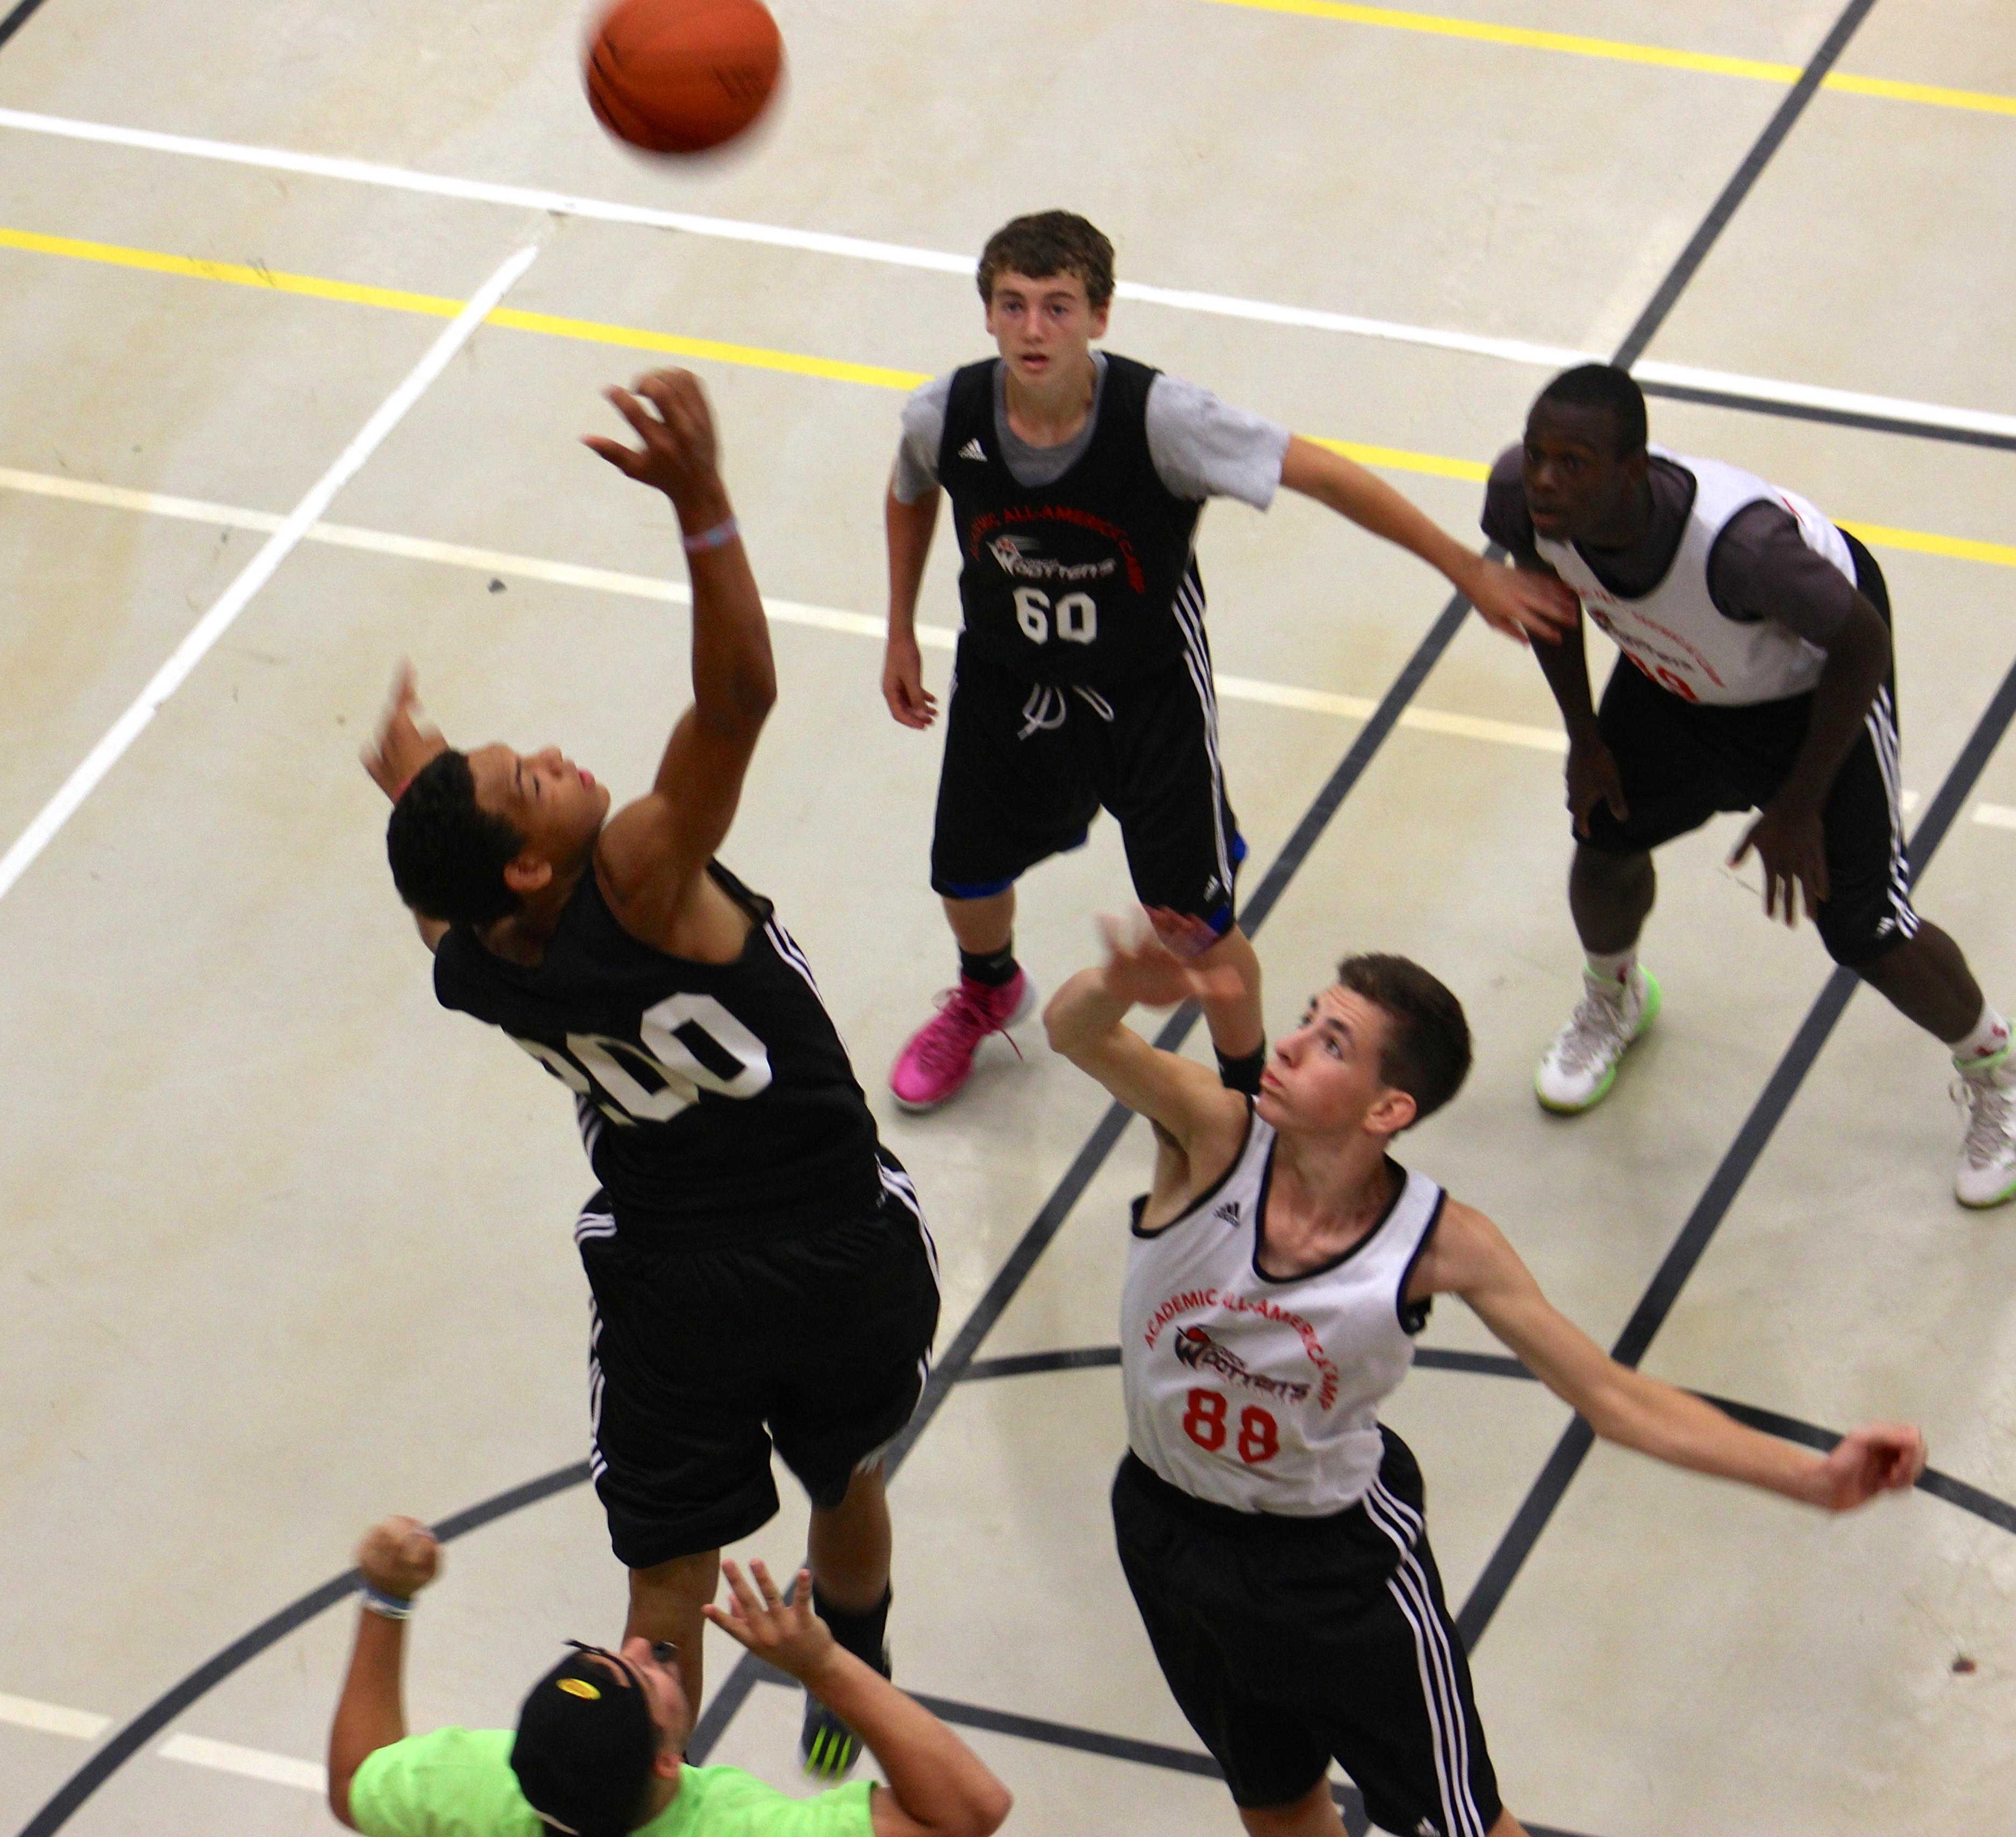 Coach Wootten's Basketball Camp: Boy's Overnight Camp